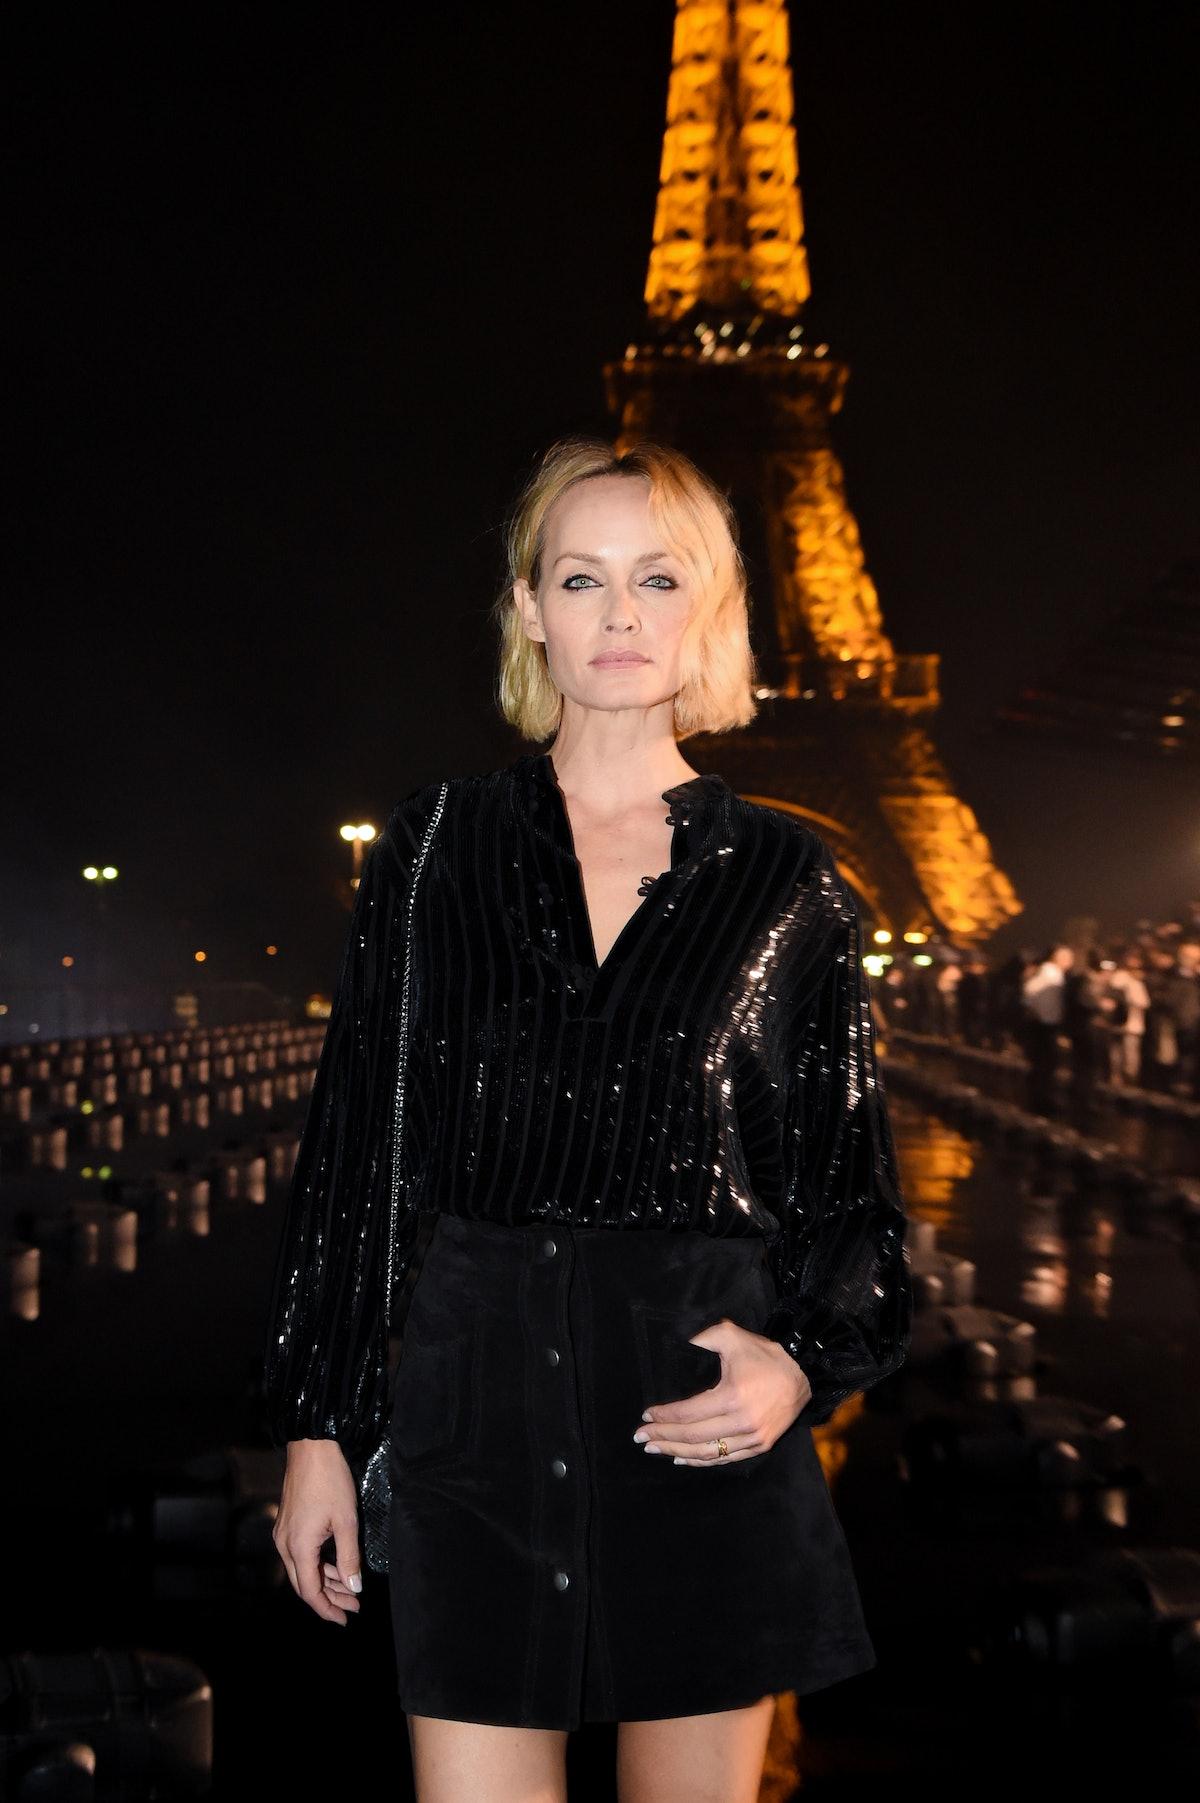 Saint Laurent : Front Row -  Paris Fashion Week - Womenswear Spring Summer 2020